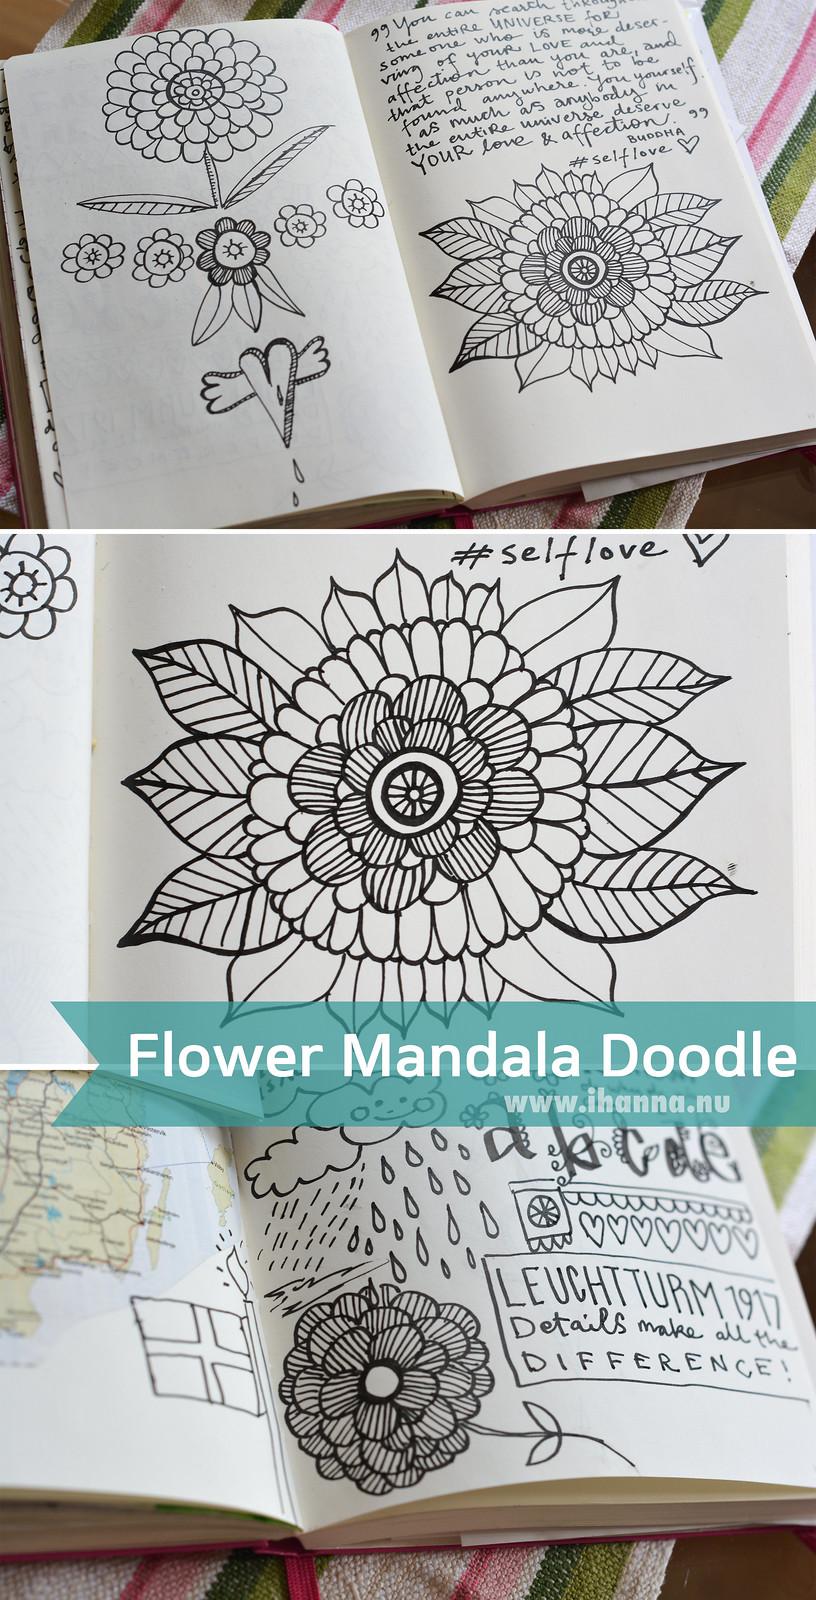 iHanna's Flower Mandala Doodle